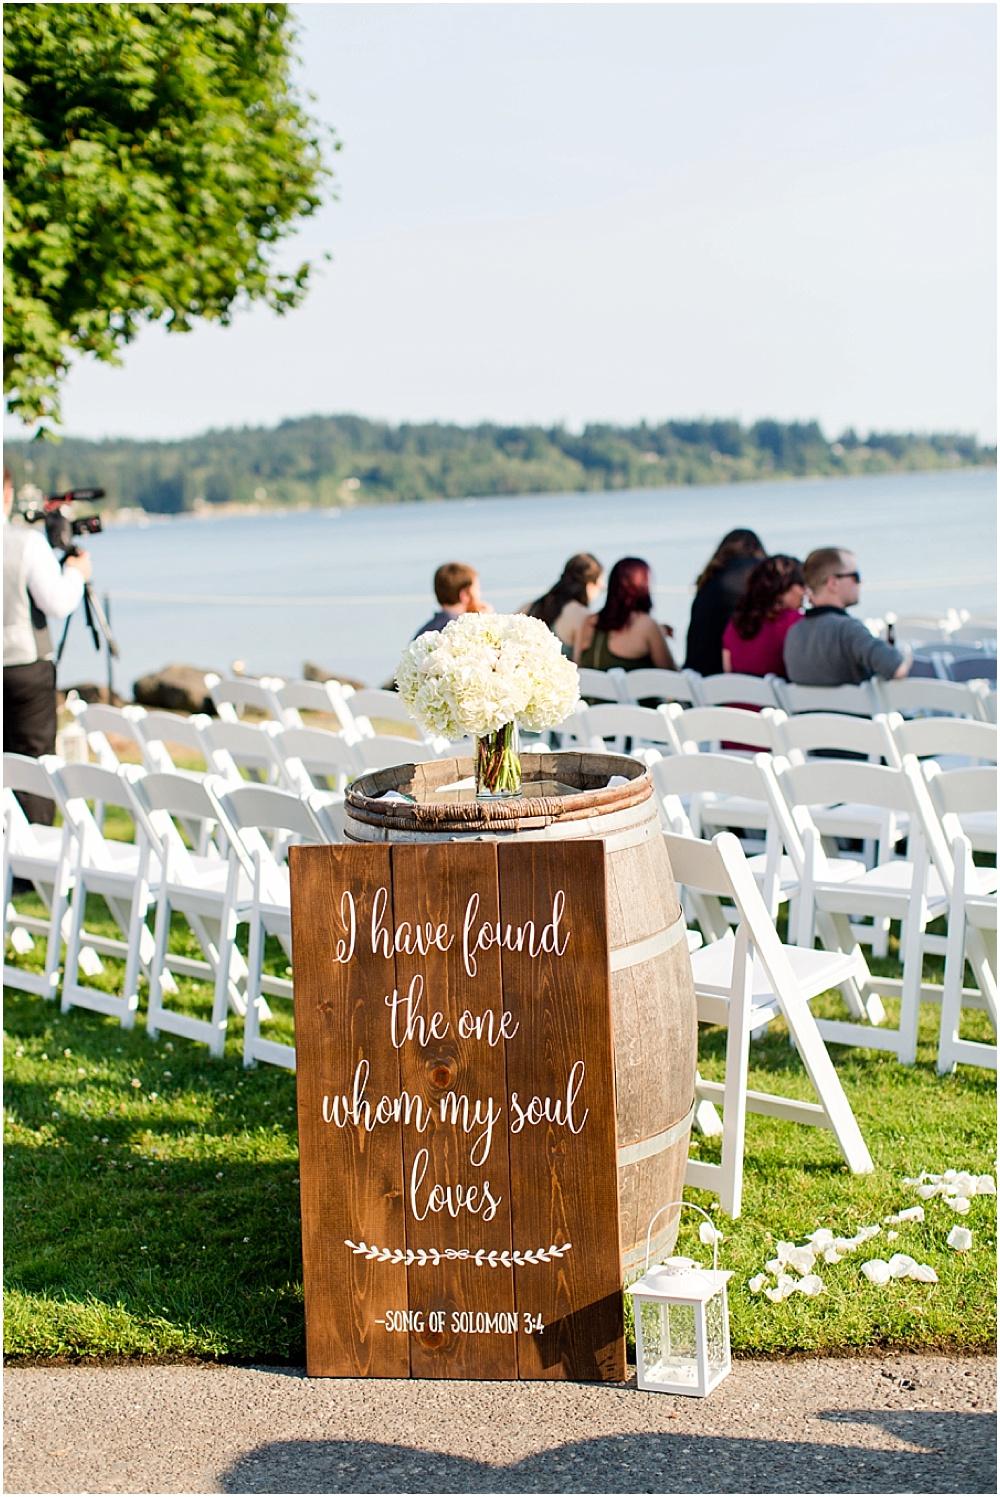 mitzner_silverdale_beach_hotel_wedding_silverdale_washington_pacific_northwest_wedding_photographer_0054